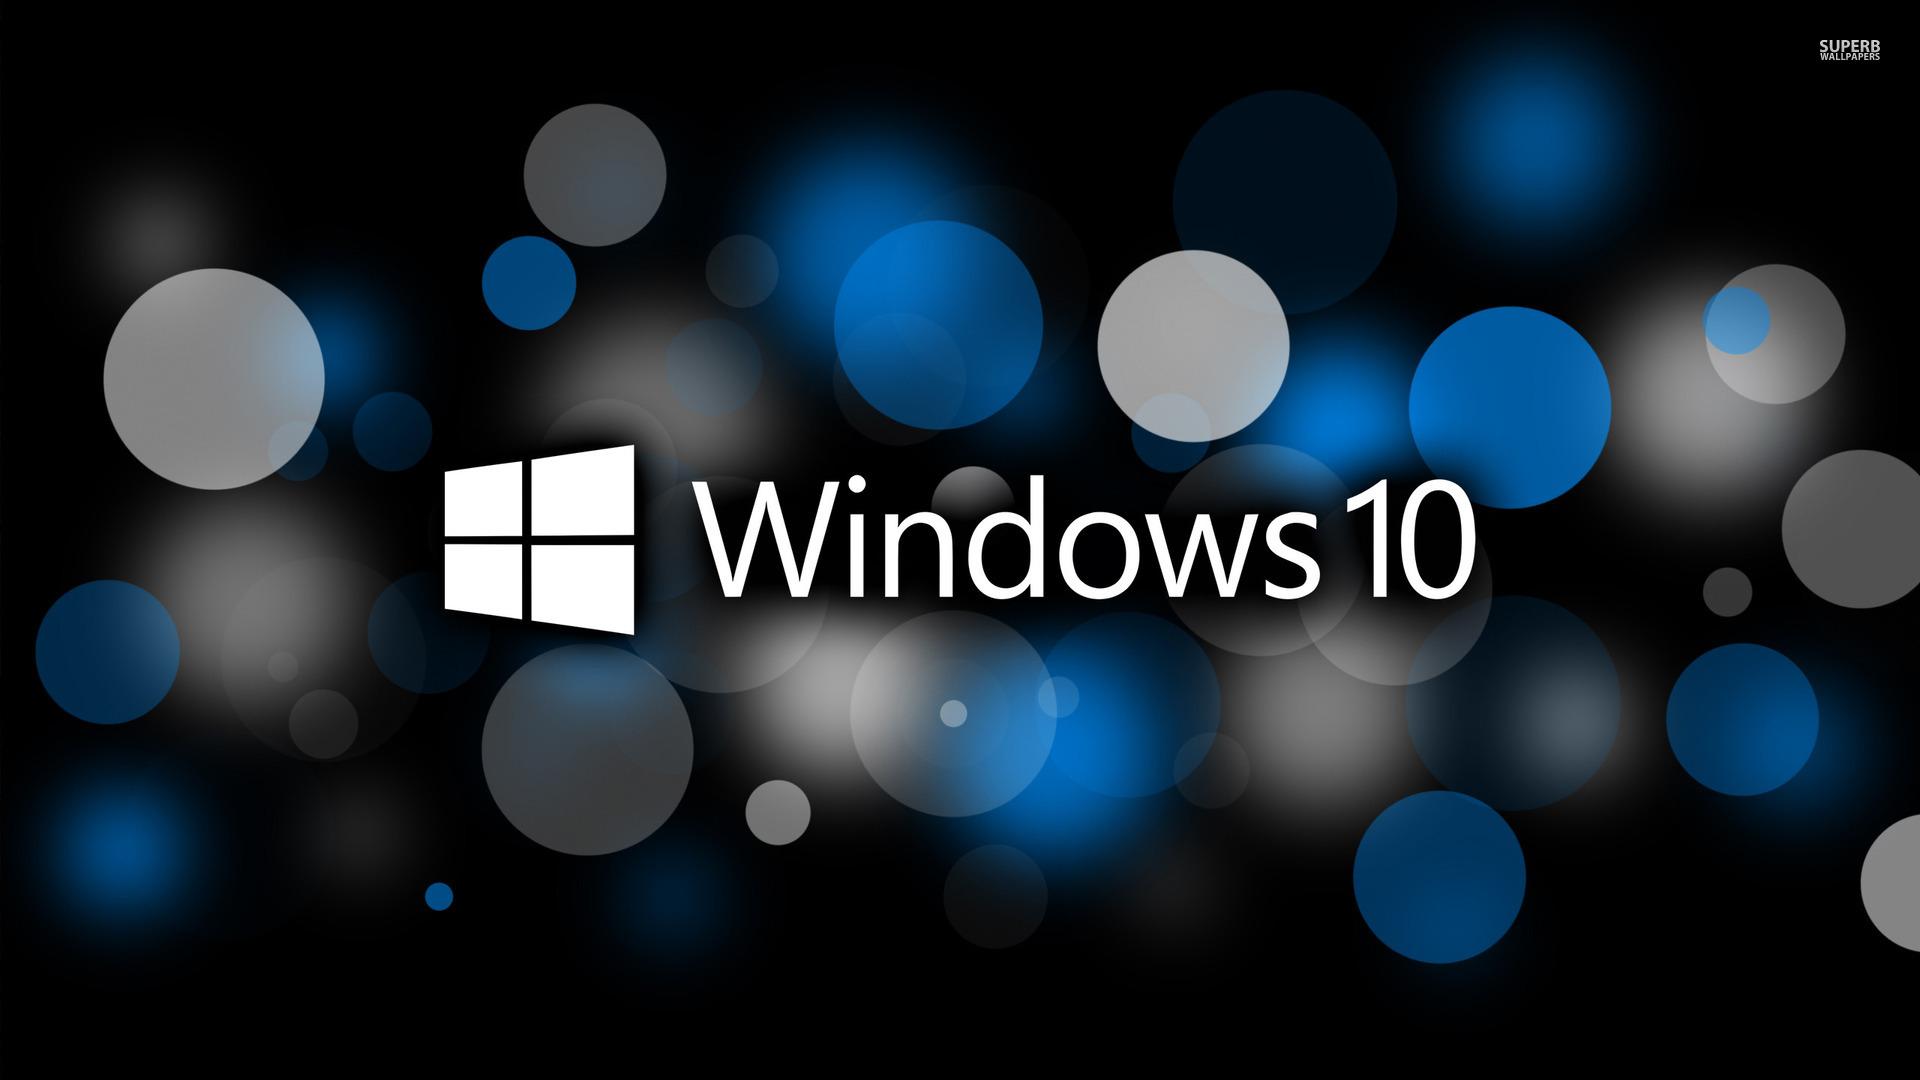 Windows 10 Wallpaper Hd Sf Wallpaper